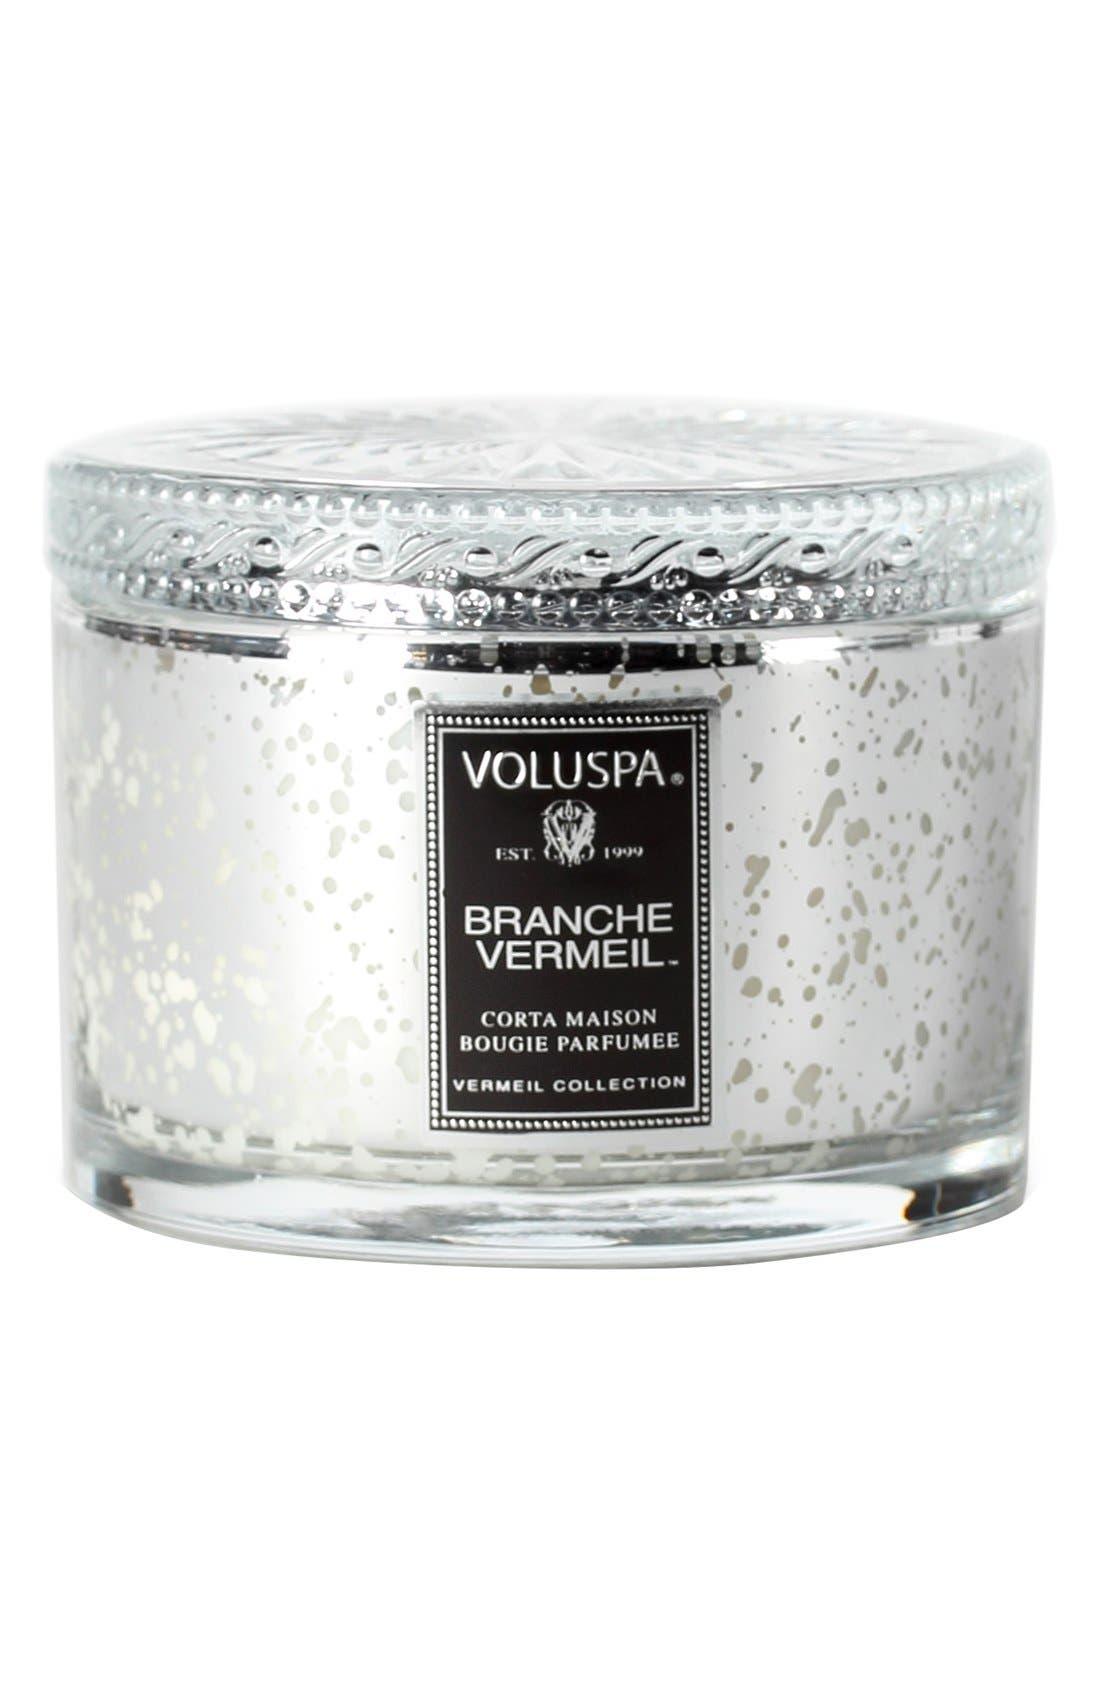 Main Image - Voluspa 'Vermeil - Branche Vermeil' Candle